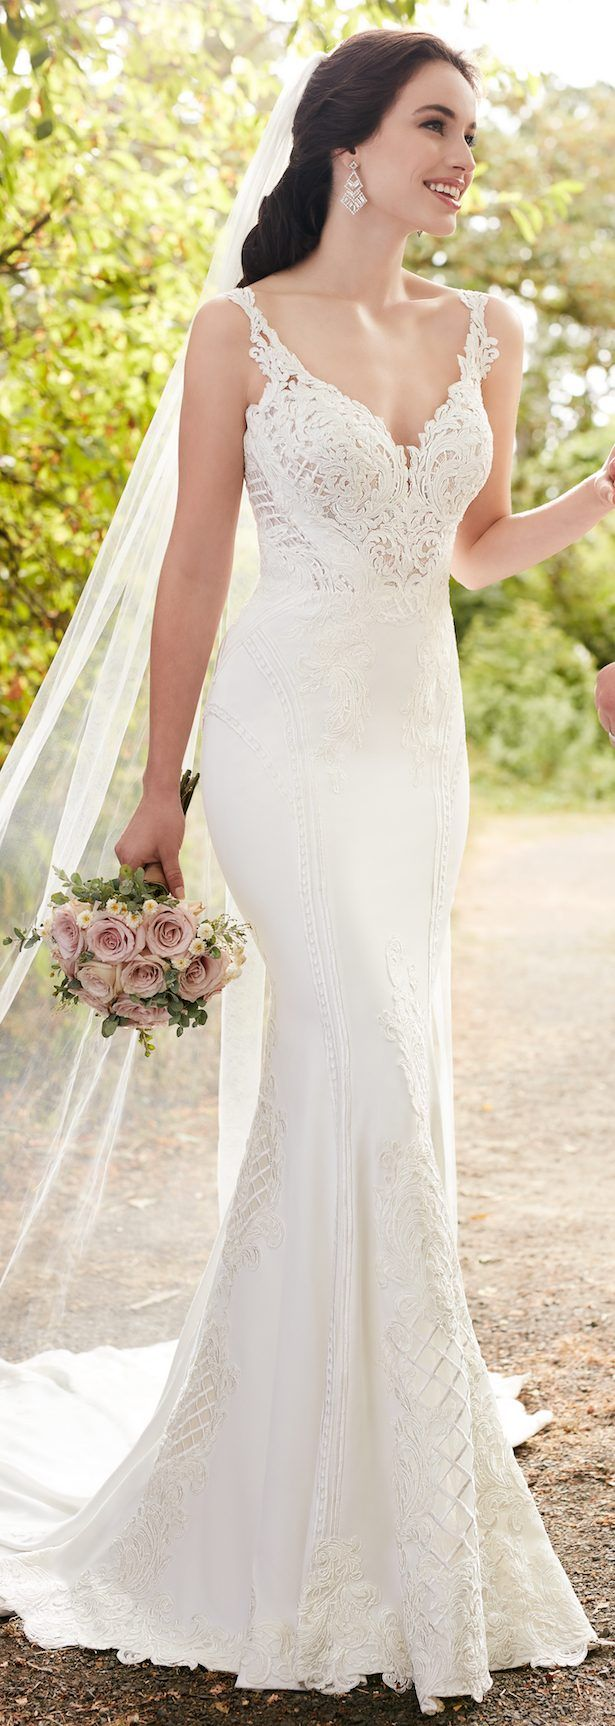 577 best Wedding images on Pinterest | Gown wedding, Wedding ideas ...